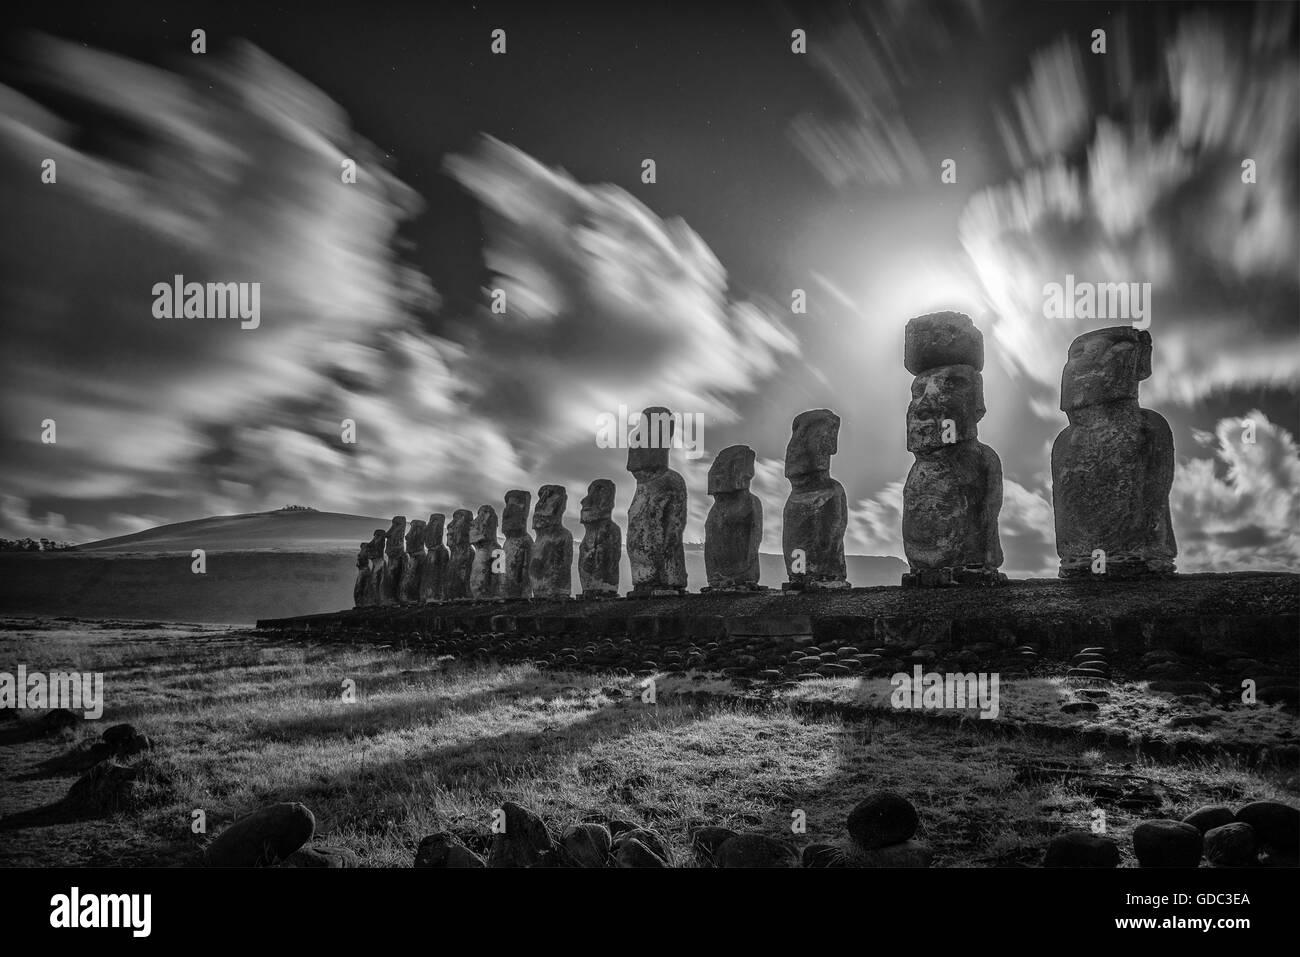 América del Sur, Chile, Isla de Pascua, Rapa Nui, Pacífico Sur,la UNESCO, Patrimonio Mundial, Foto de stock